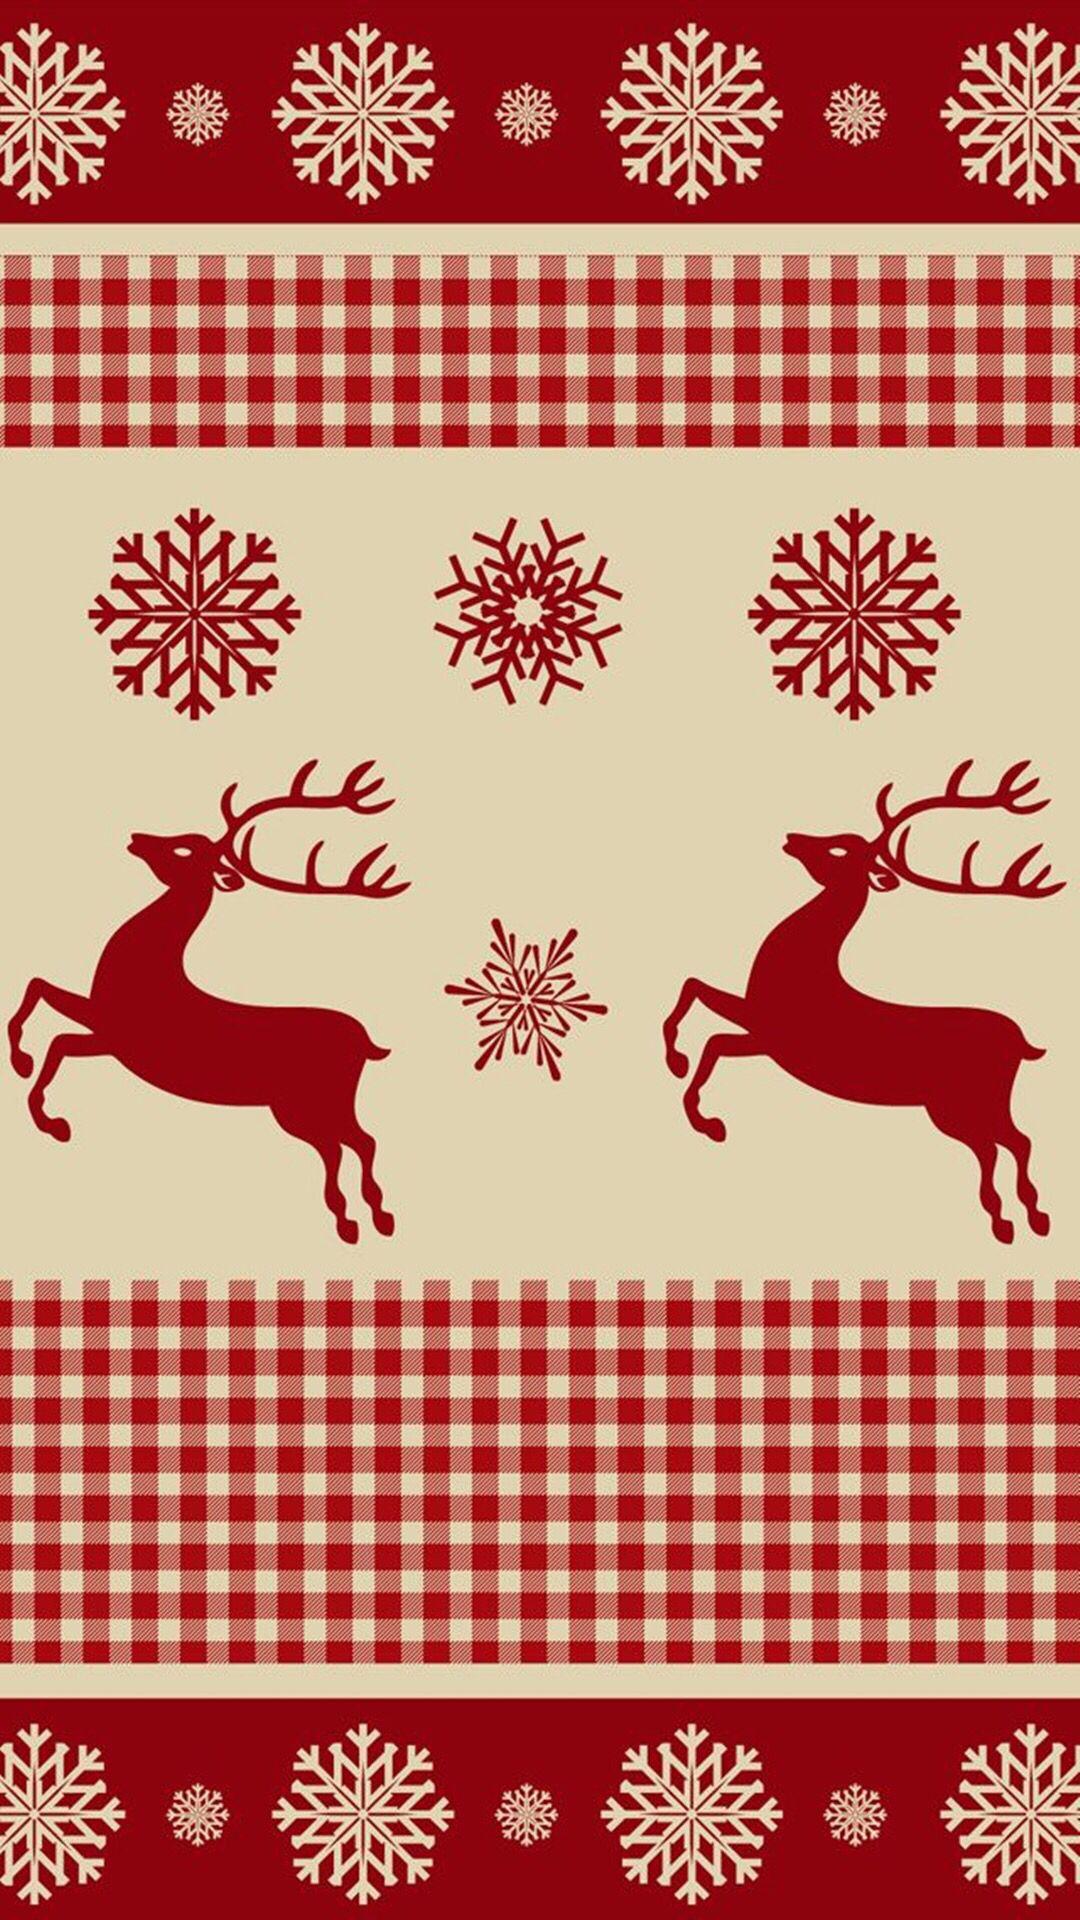 Christmas Wallpaper - Zedge - Vintage Christmas Wallpapers Iphone , HD Wallpaper & Backgrounds